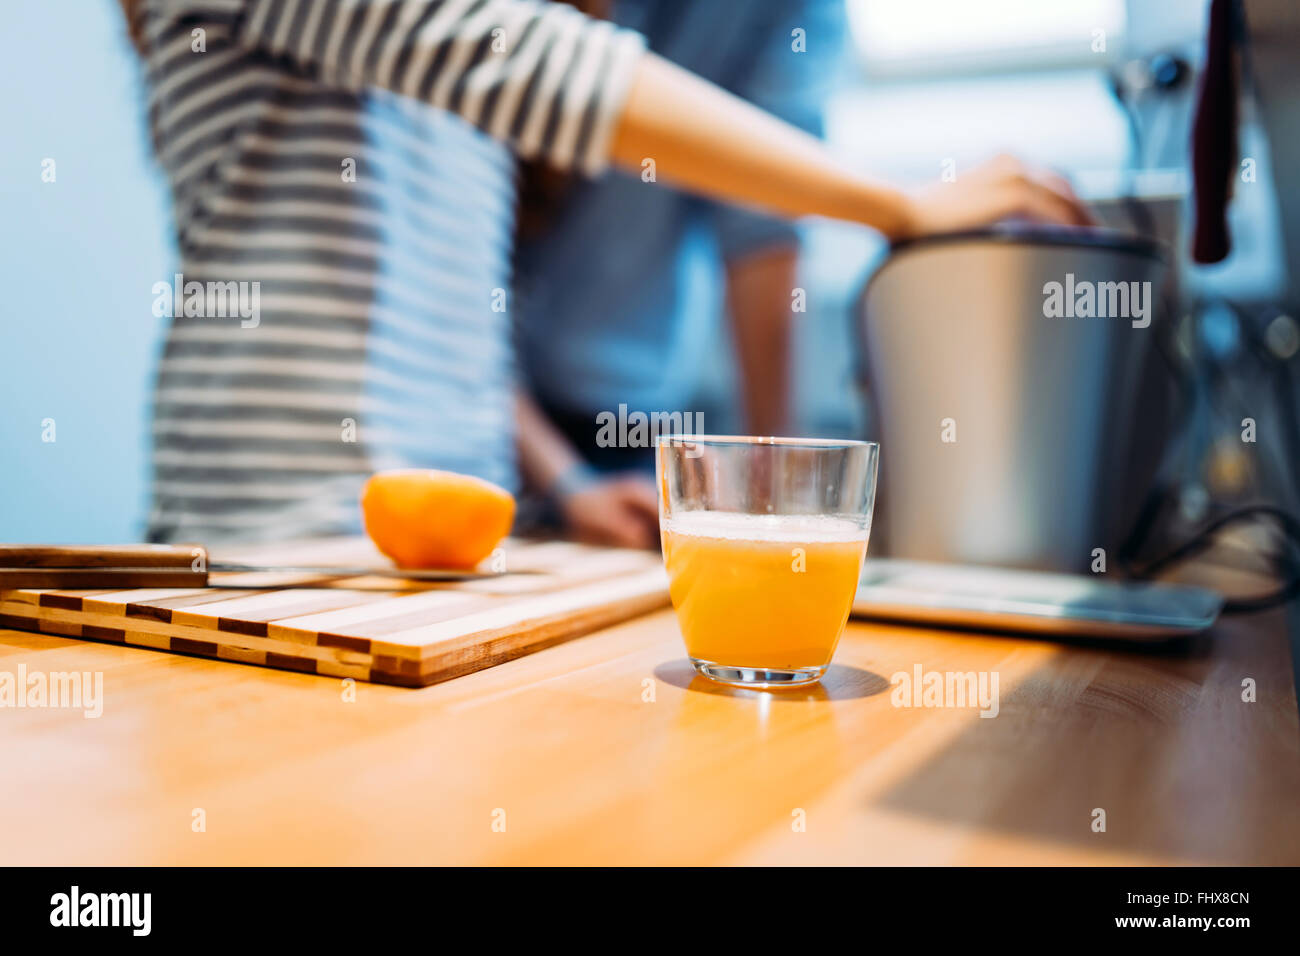 Home made orange juice from fresh organic oranges - Stock Image